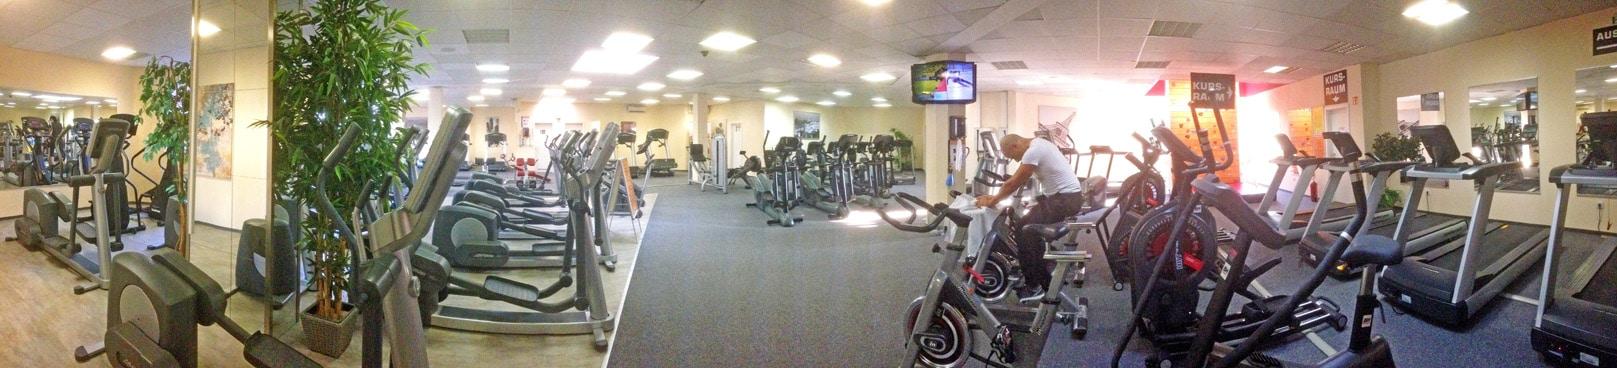 Fitnesspark Limburg Cardio Geräte